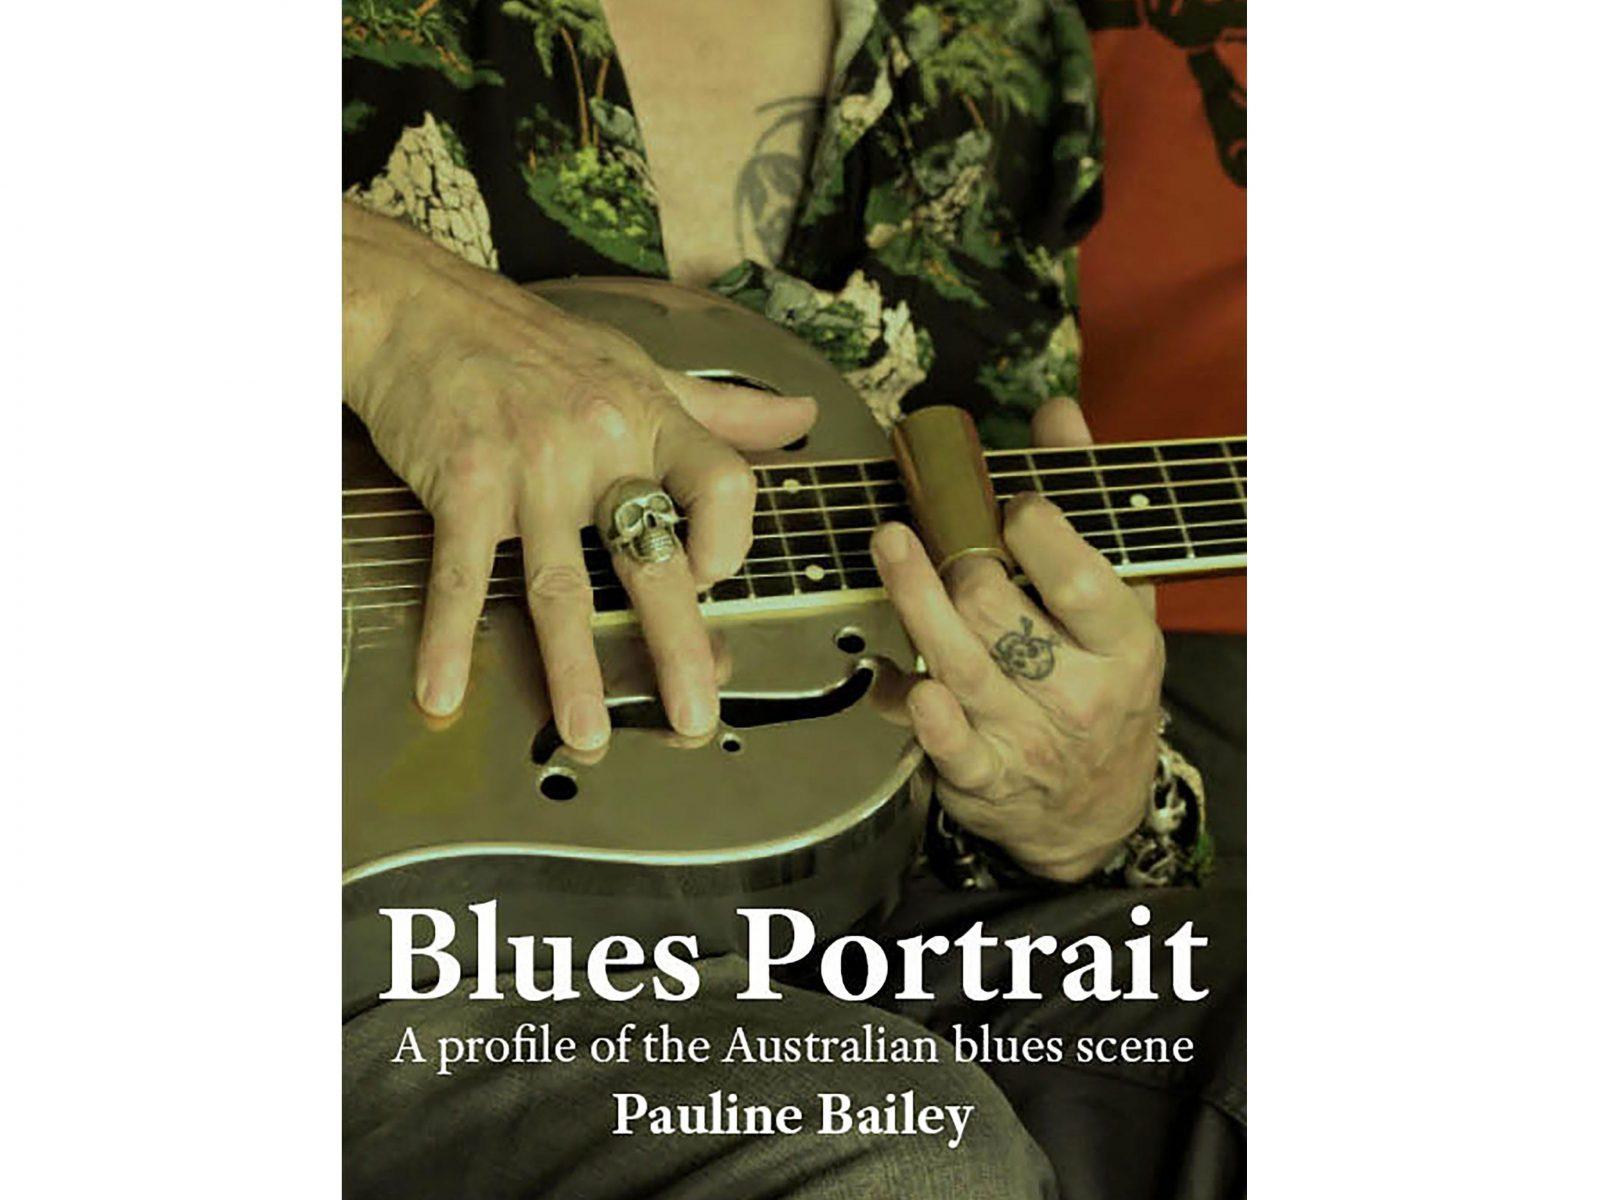 Blues Portrait - A profile of the Australian blues scene_Front cover